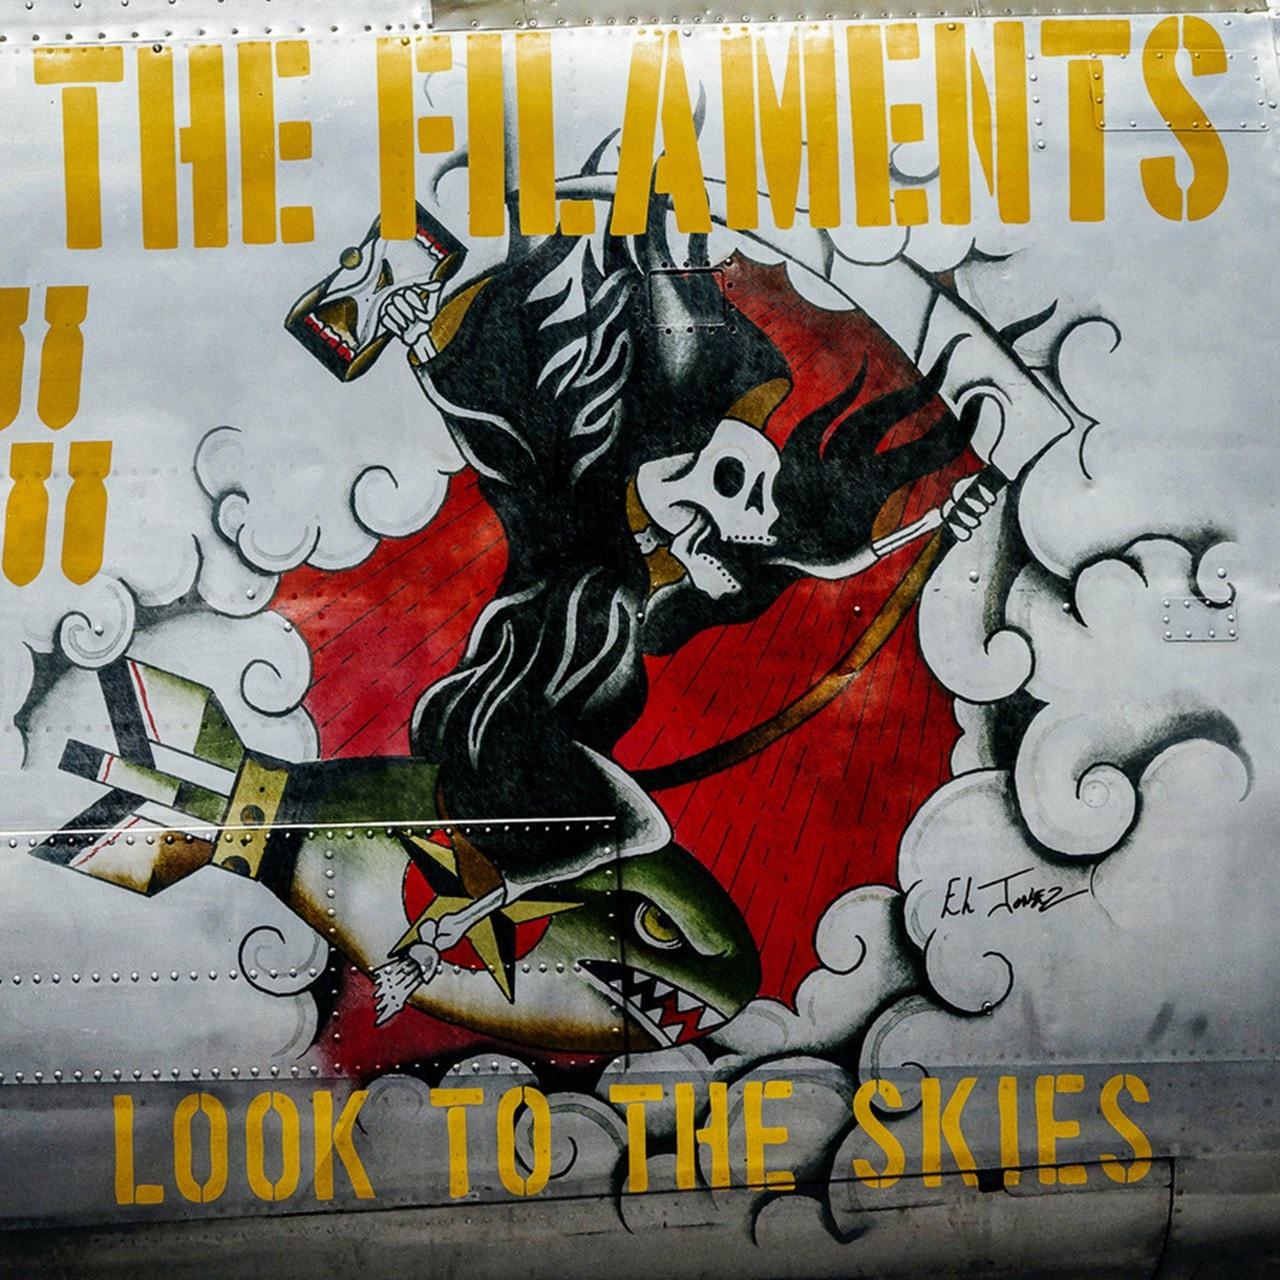 Look to the Skies - 1